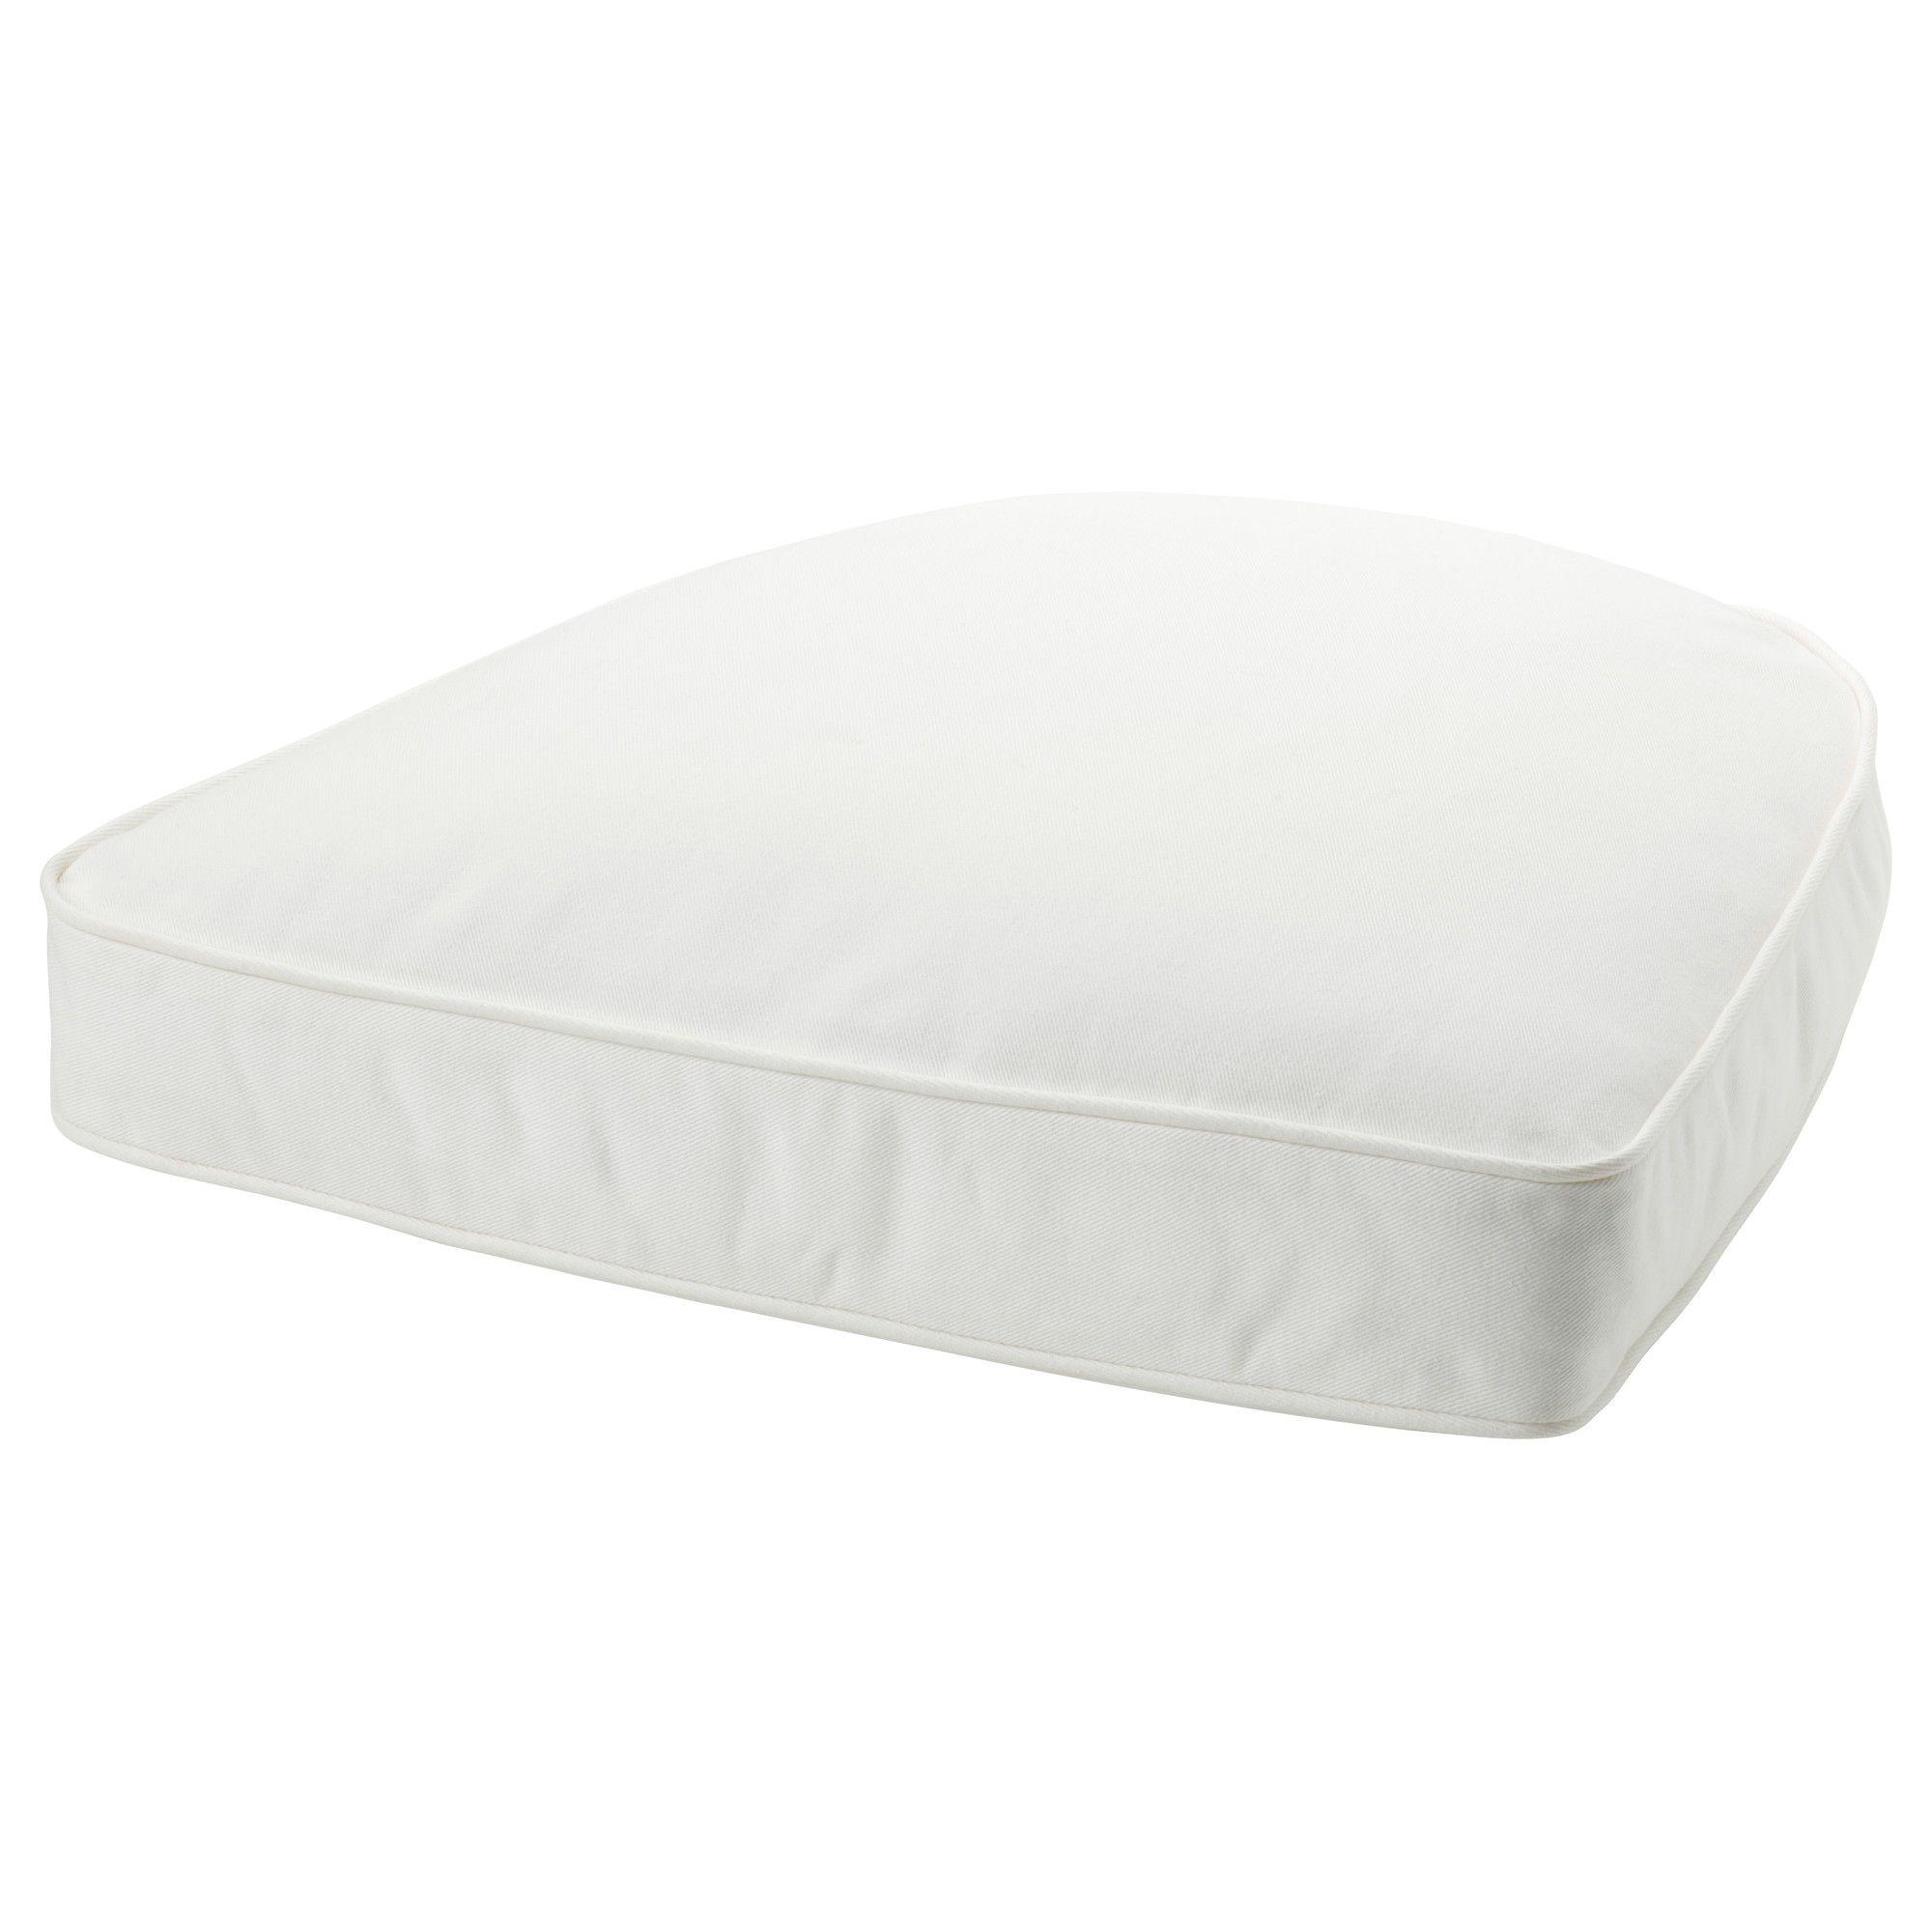 Djupvik Tyyny Blekinge Valkoinen Cushions Cushions Ikea Wicker Furniture Cushions